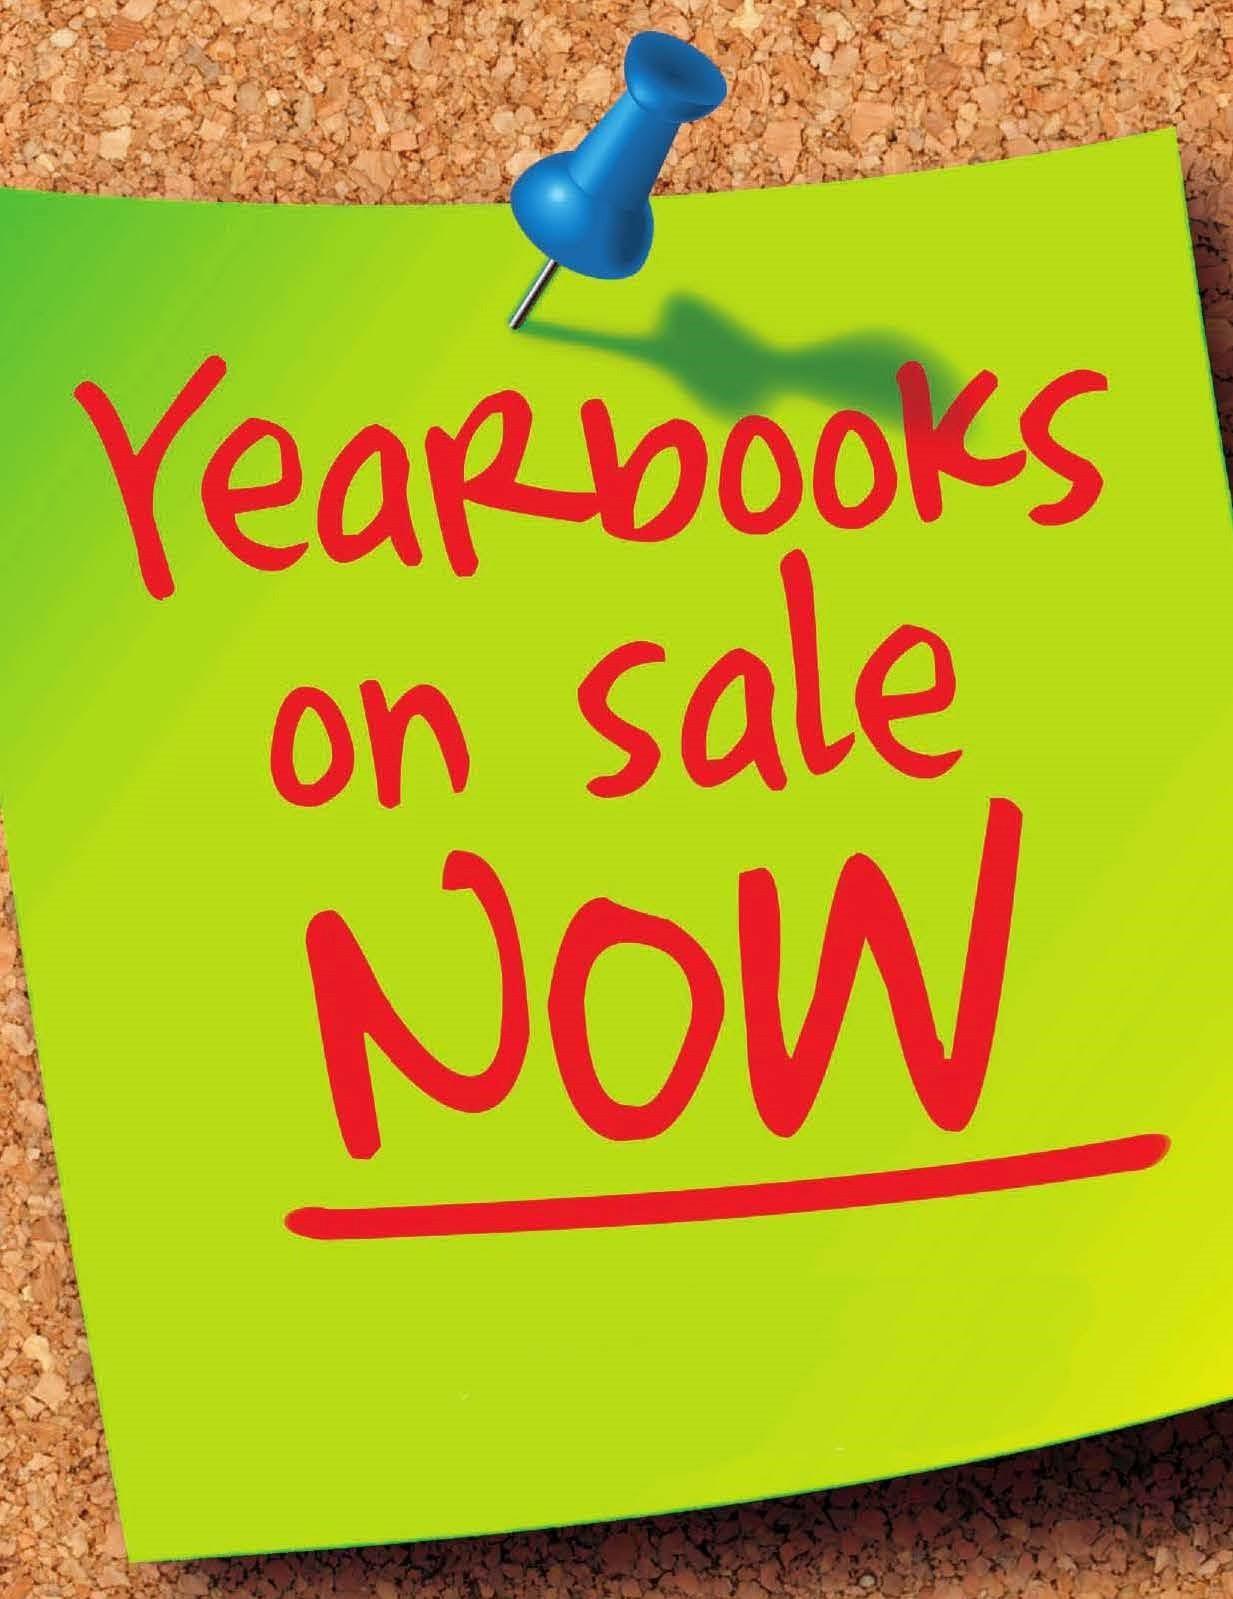 2017 Yearbooks